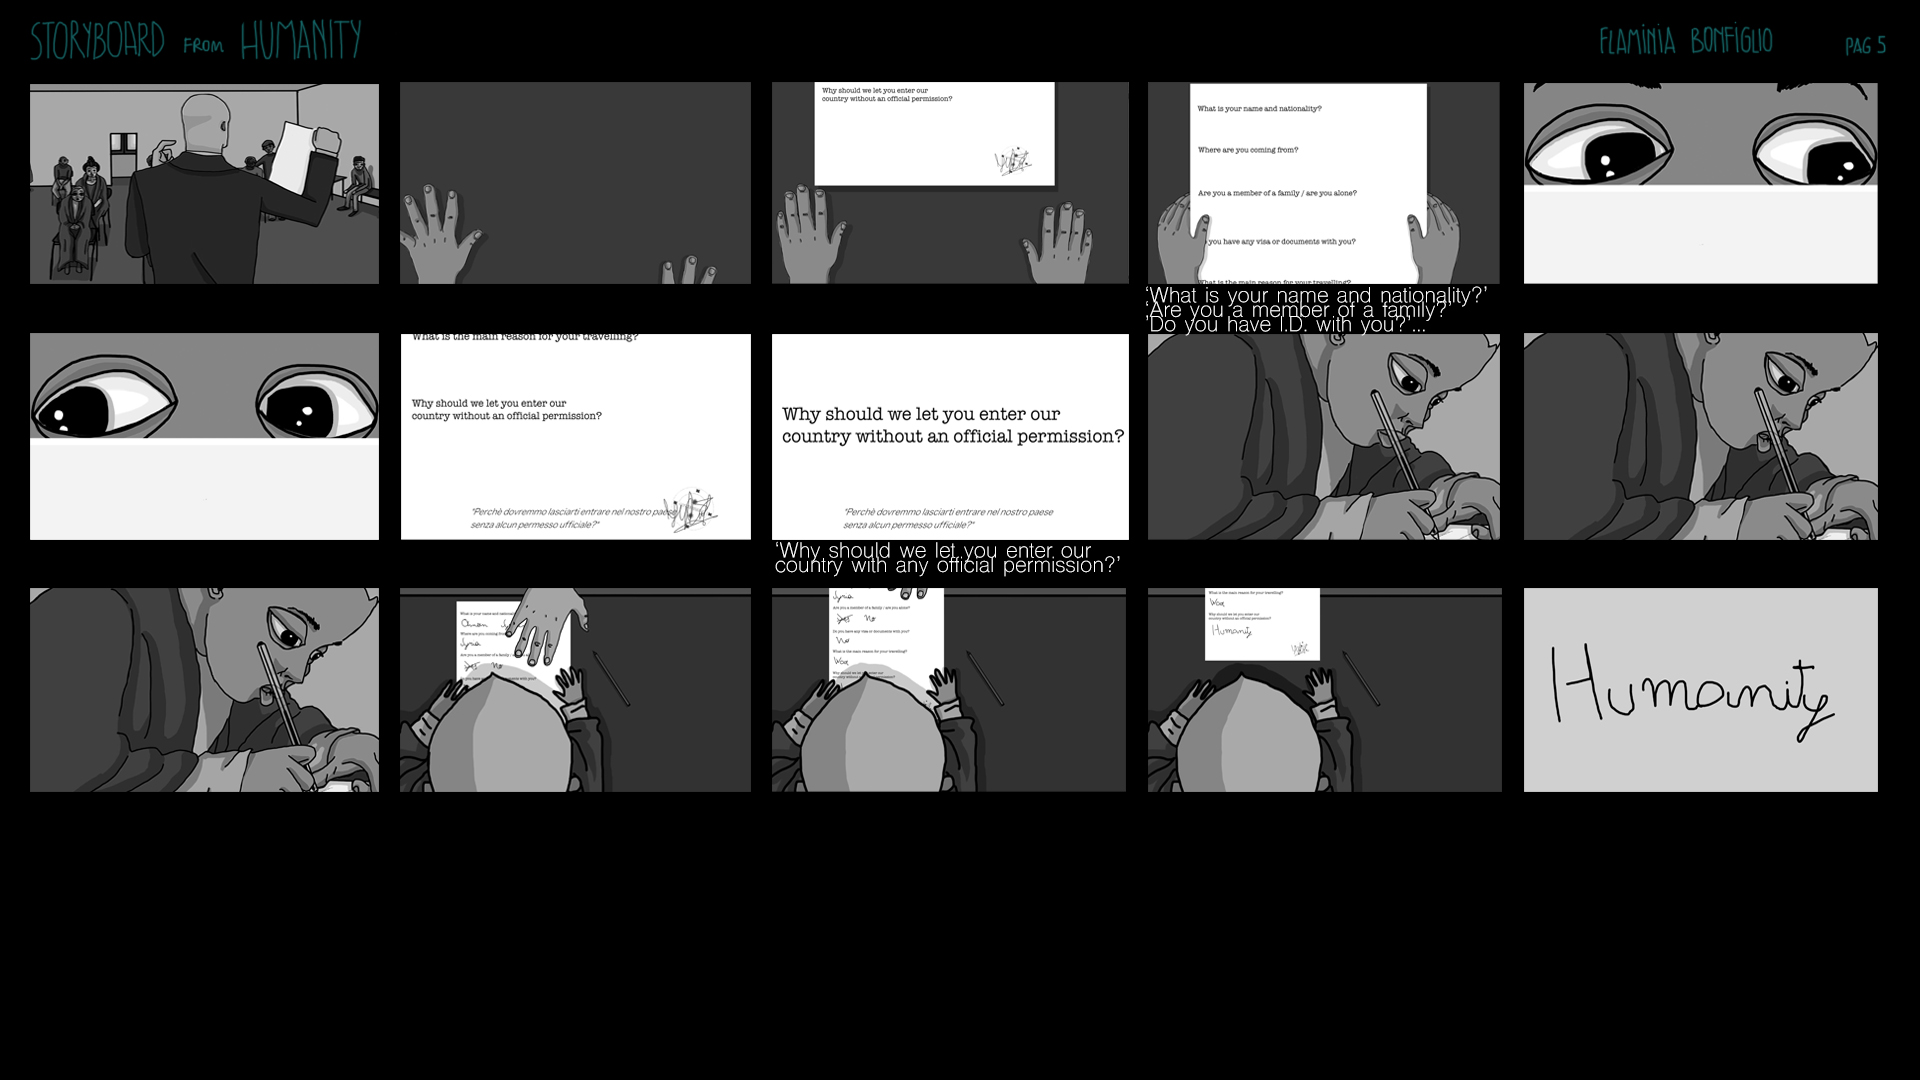 storyboard digital humanity_b&w_corrected_5.jpg